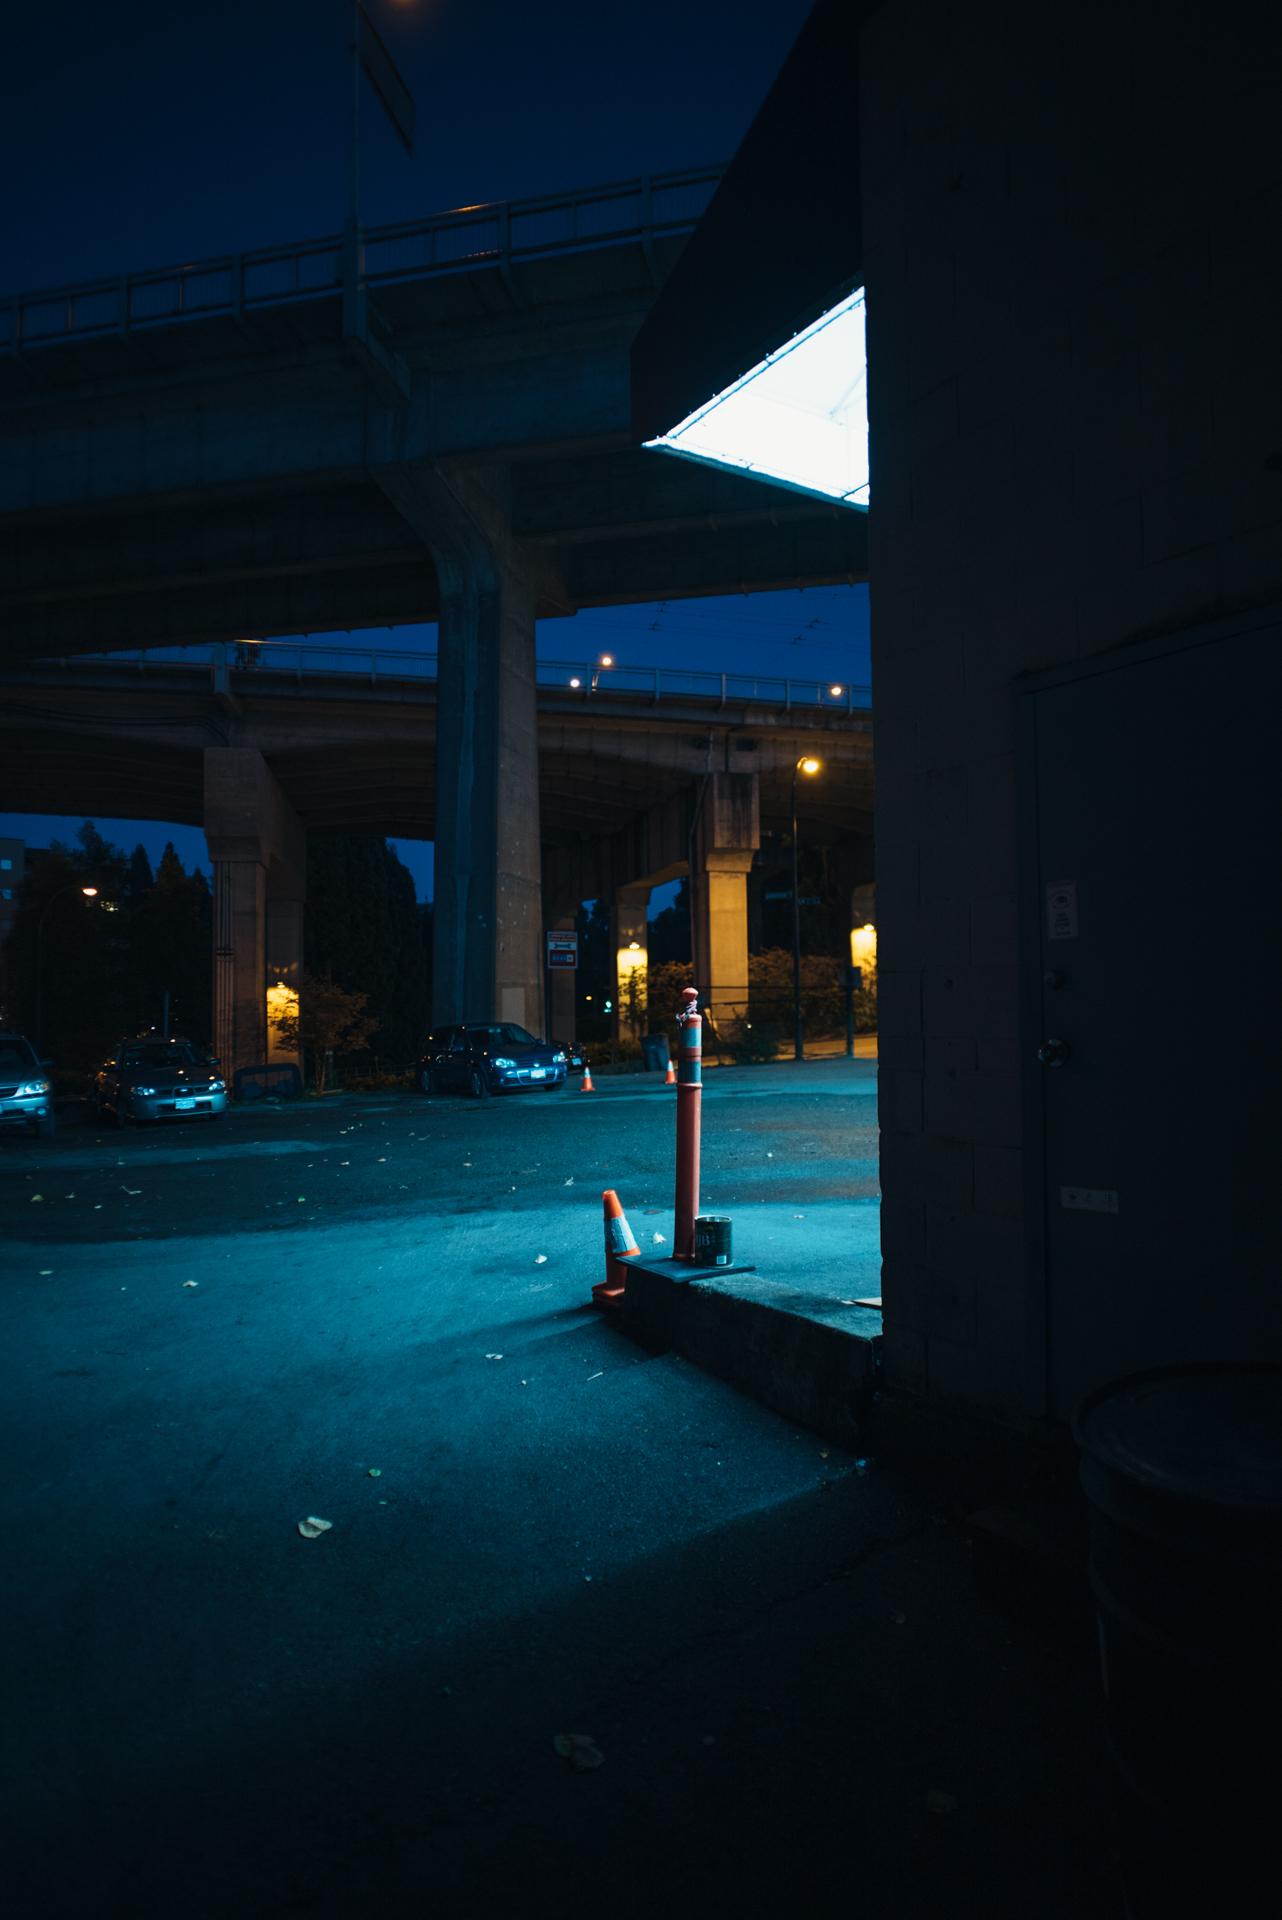 spaces+light-16.jpg